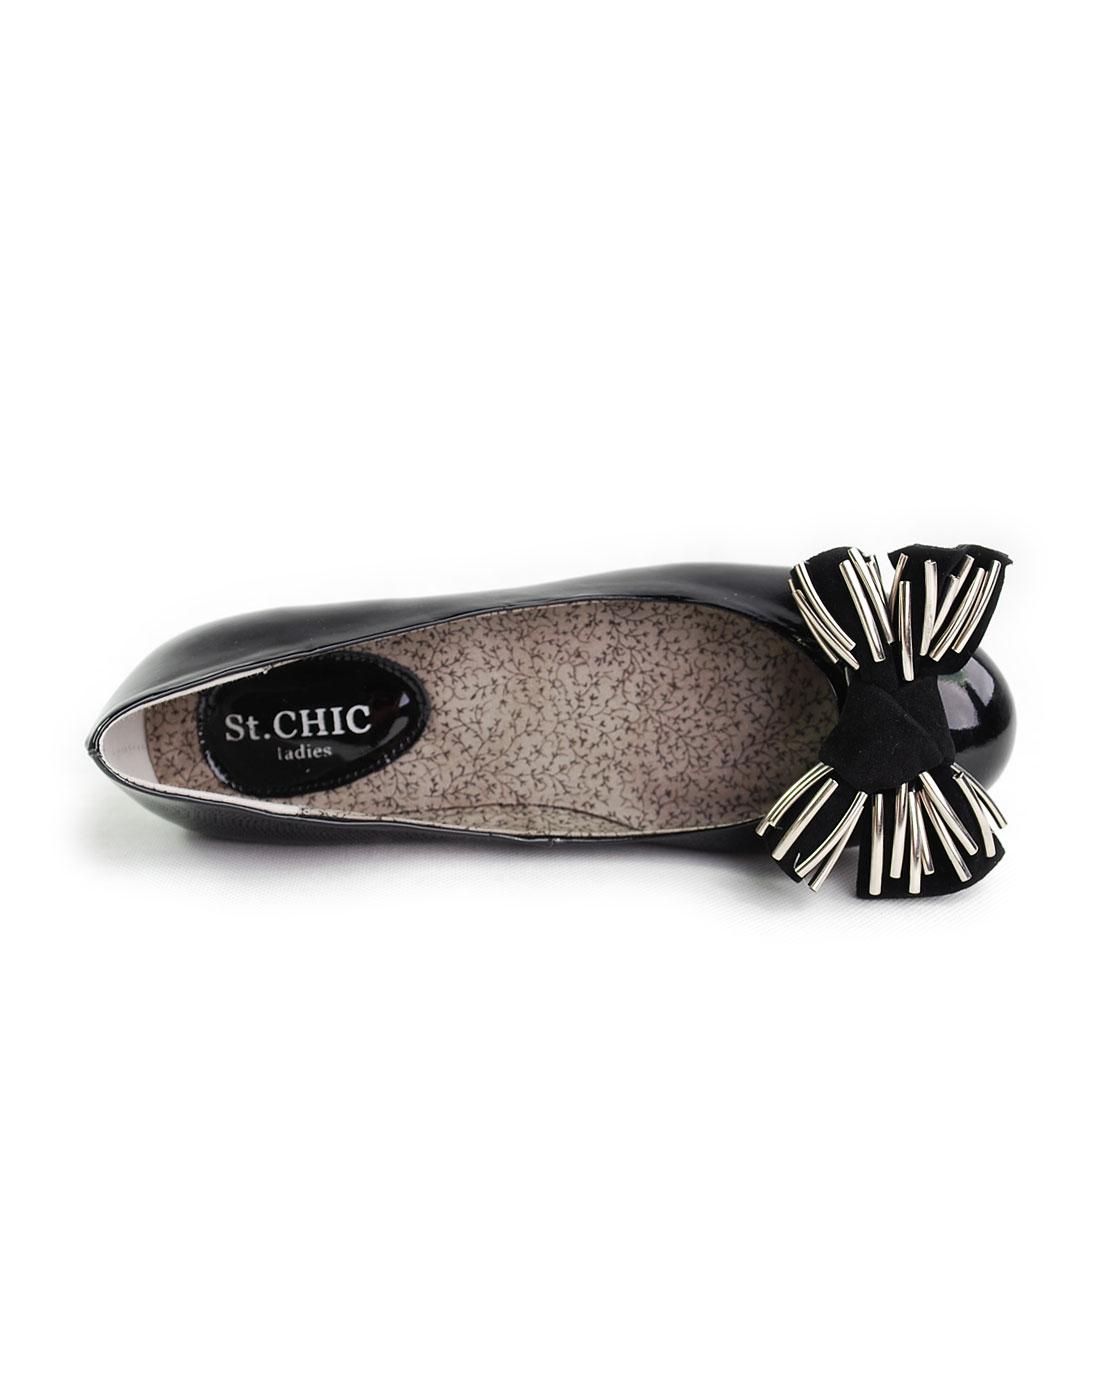 chic女款黑色单鞋p22a20909m